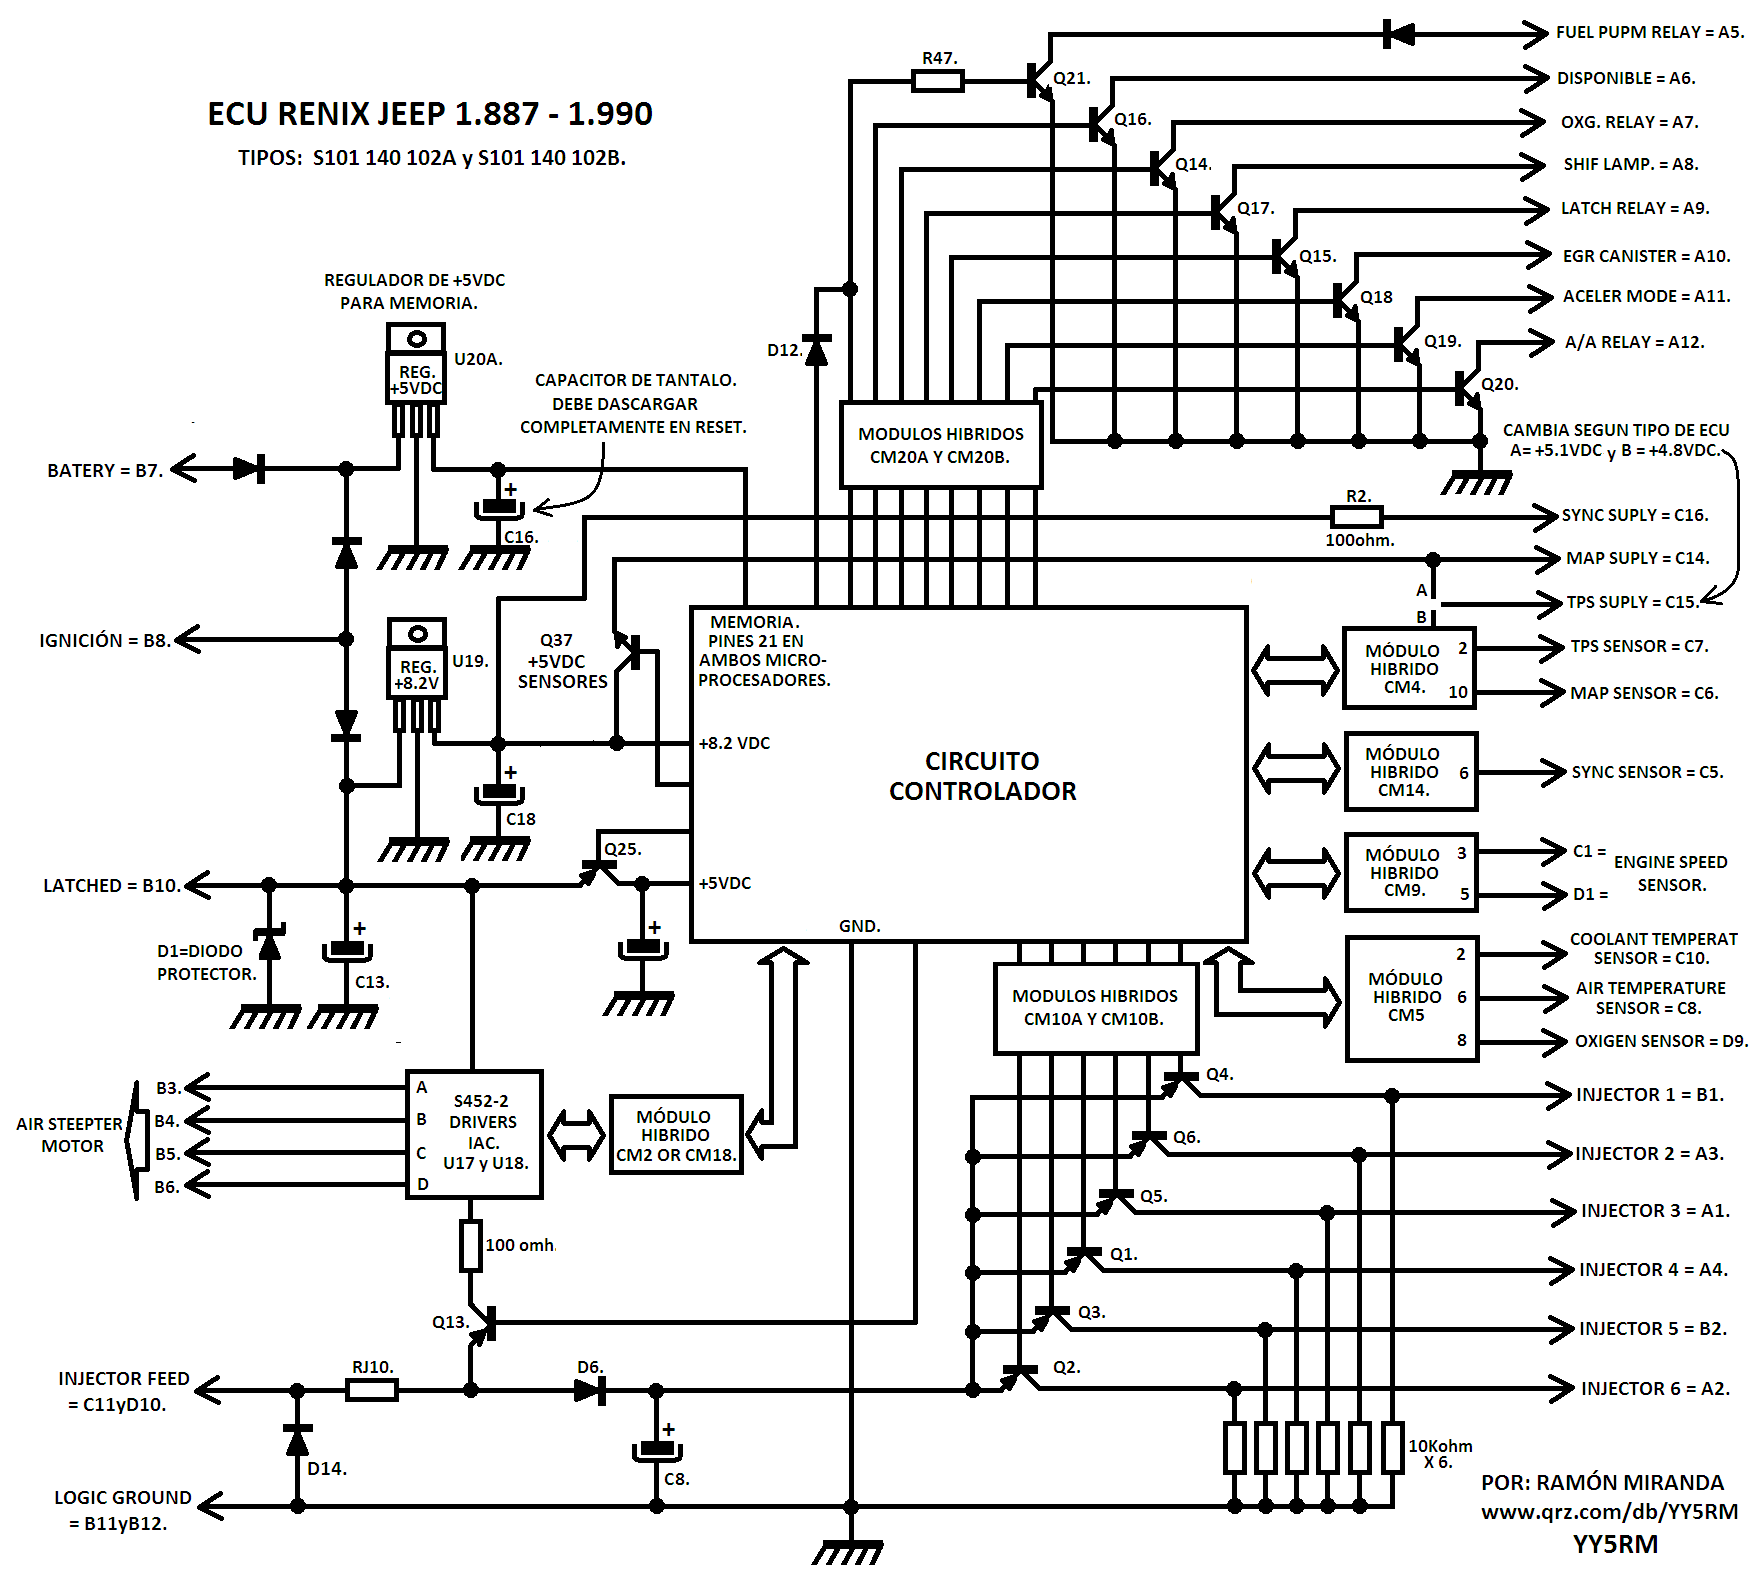 Ecu Renix Jeep 88 90 Diagrama